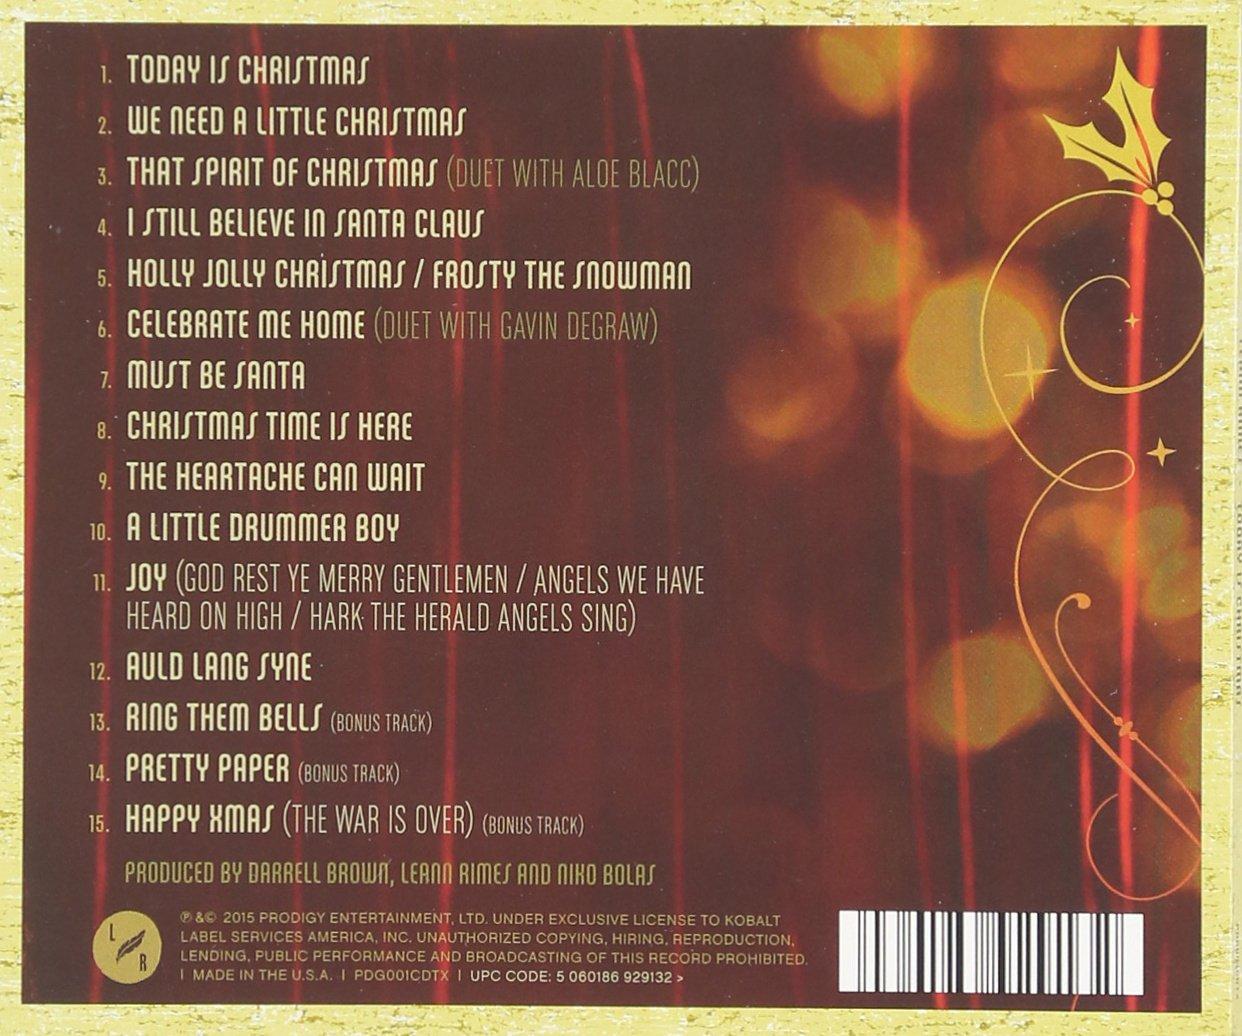 LEANN RIMES - Today Is Christmas (TG) - Amazon.com Music